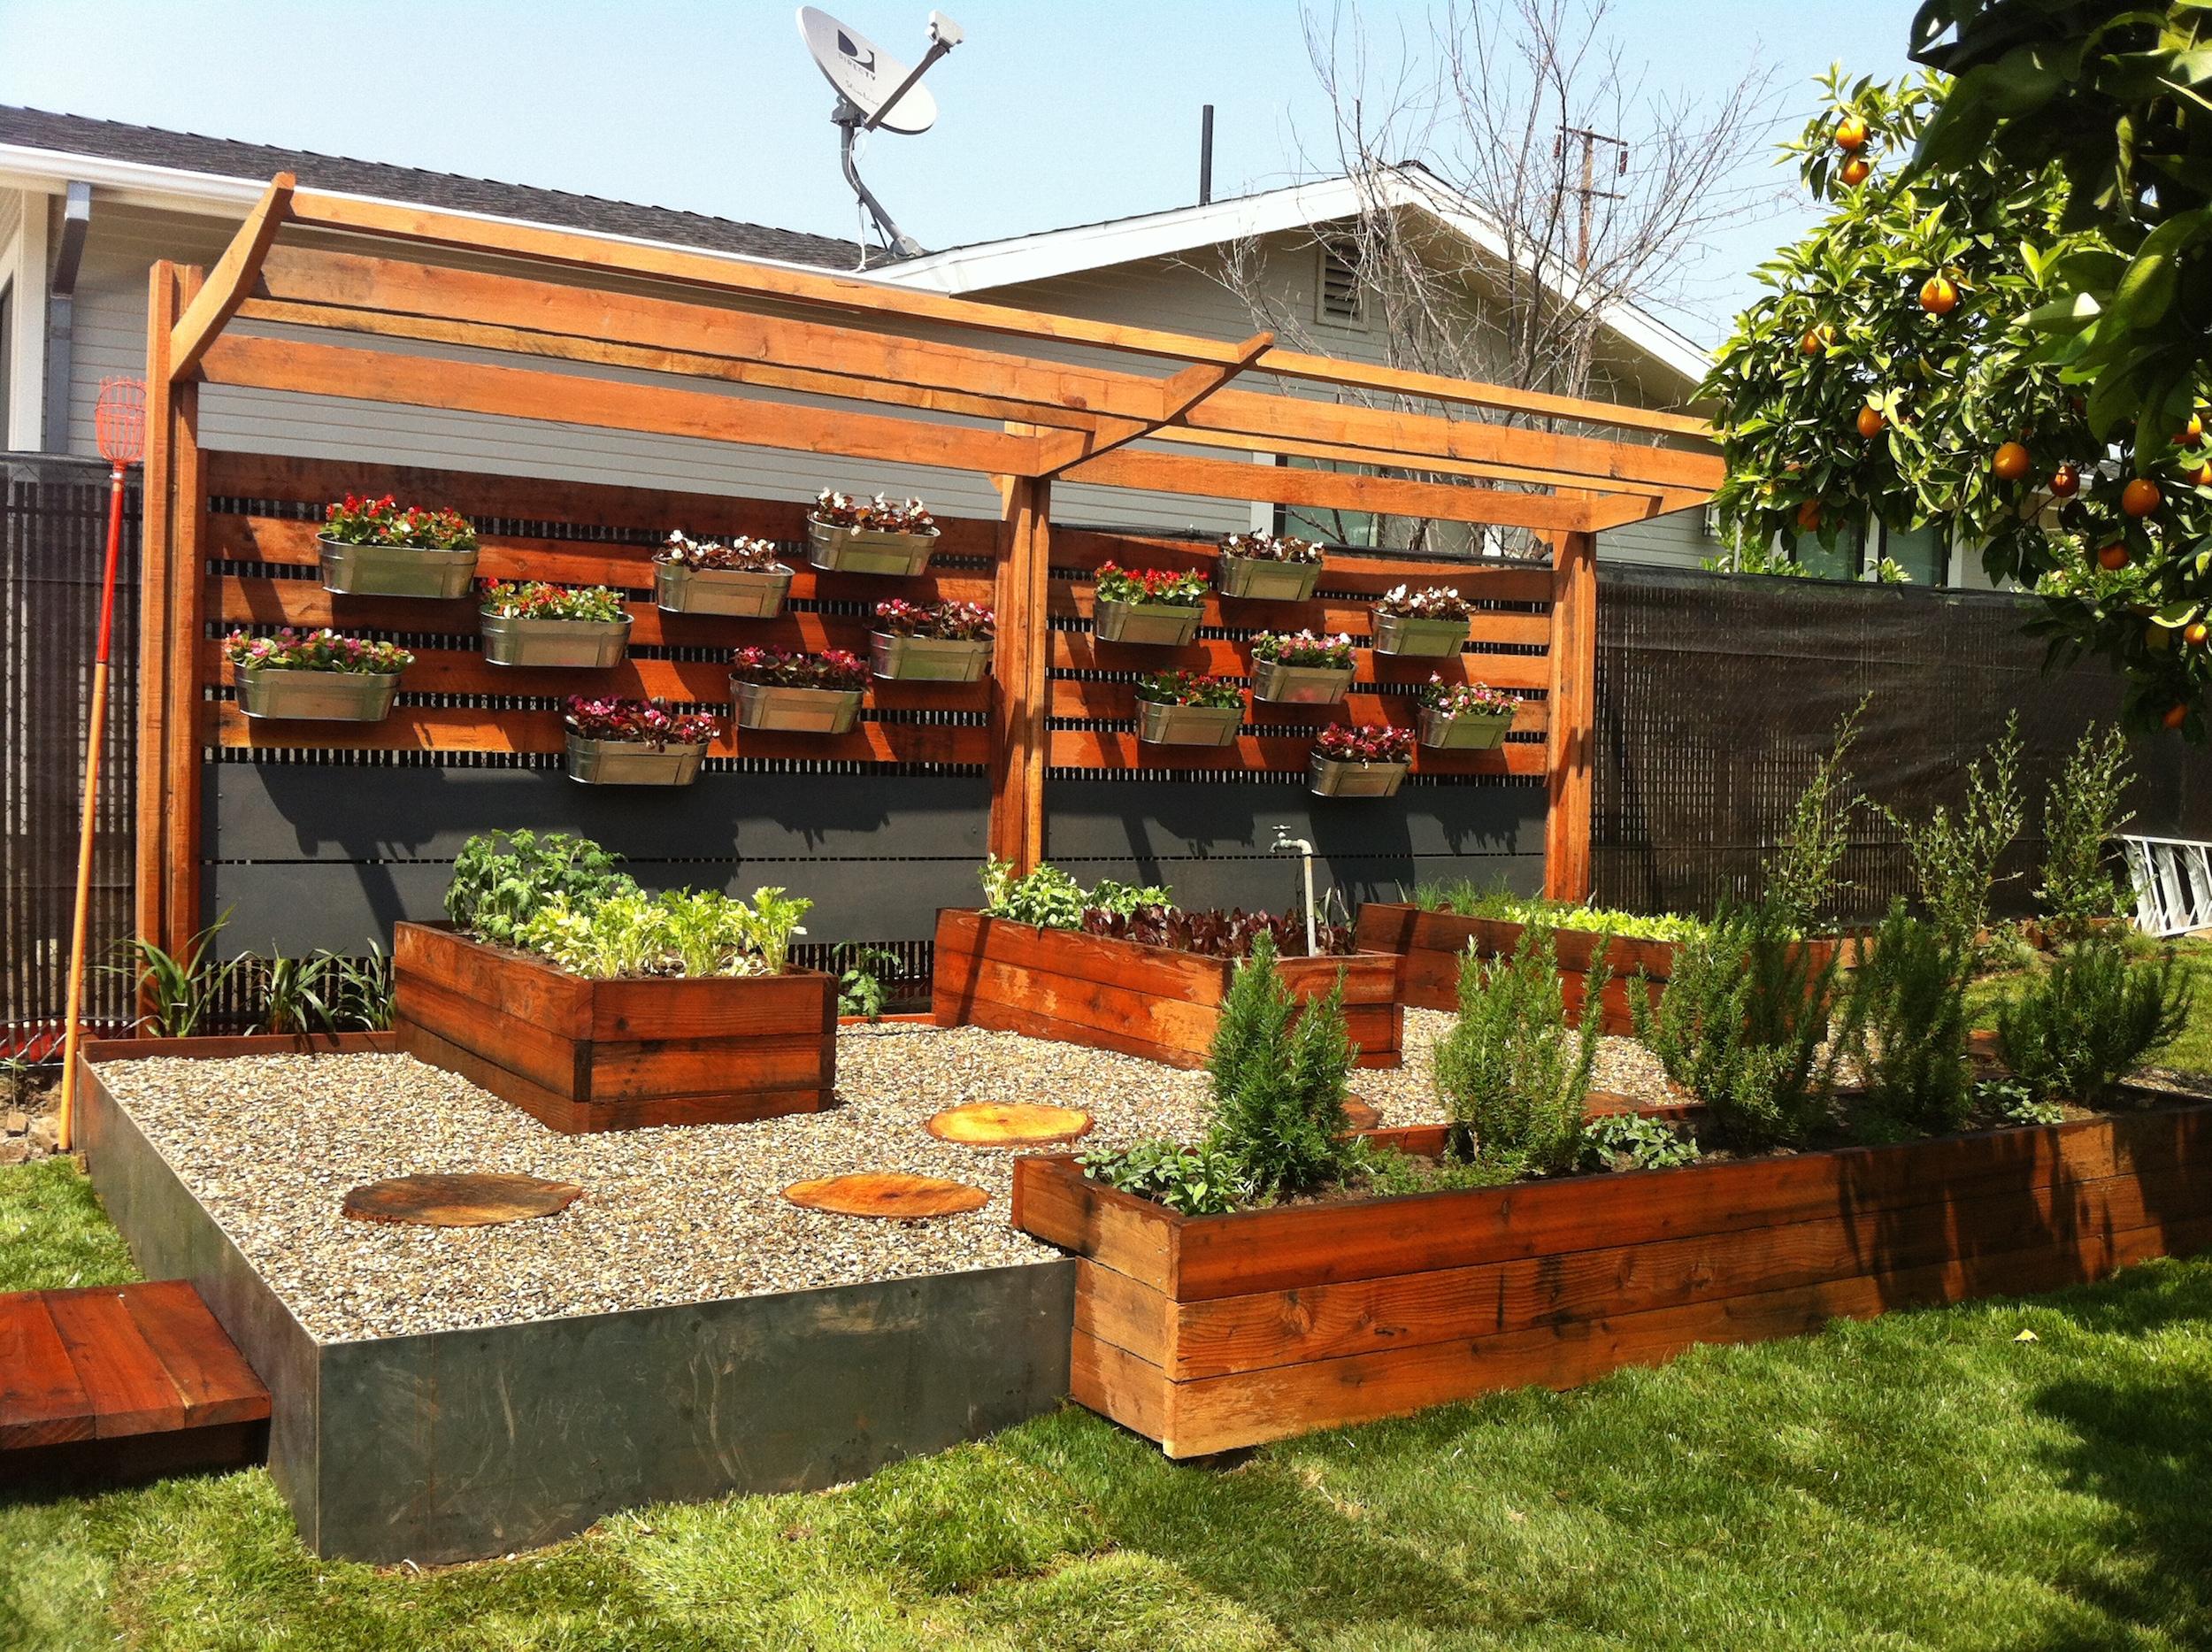 17 low maintenance landscaping ideas - chris and peyton lambton backyard  design tips VFQJNTY